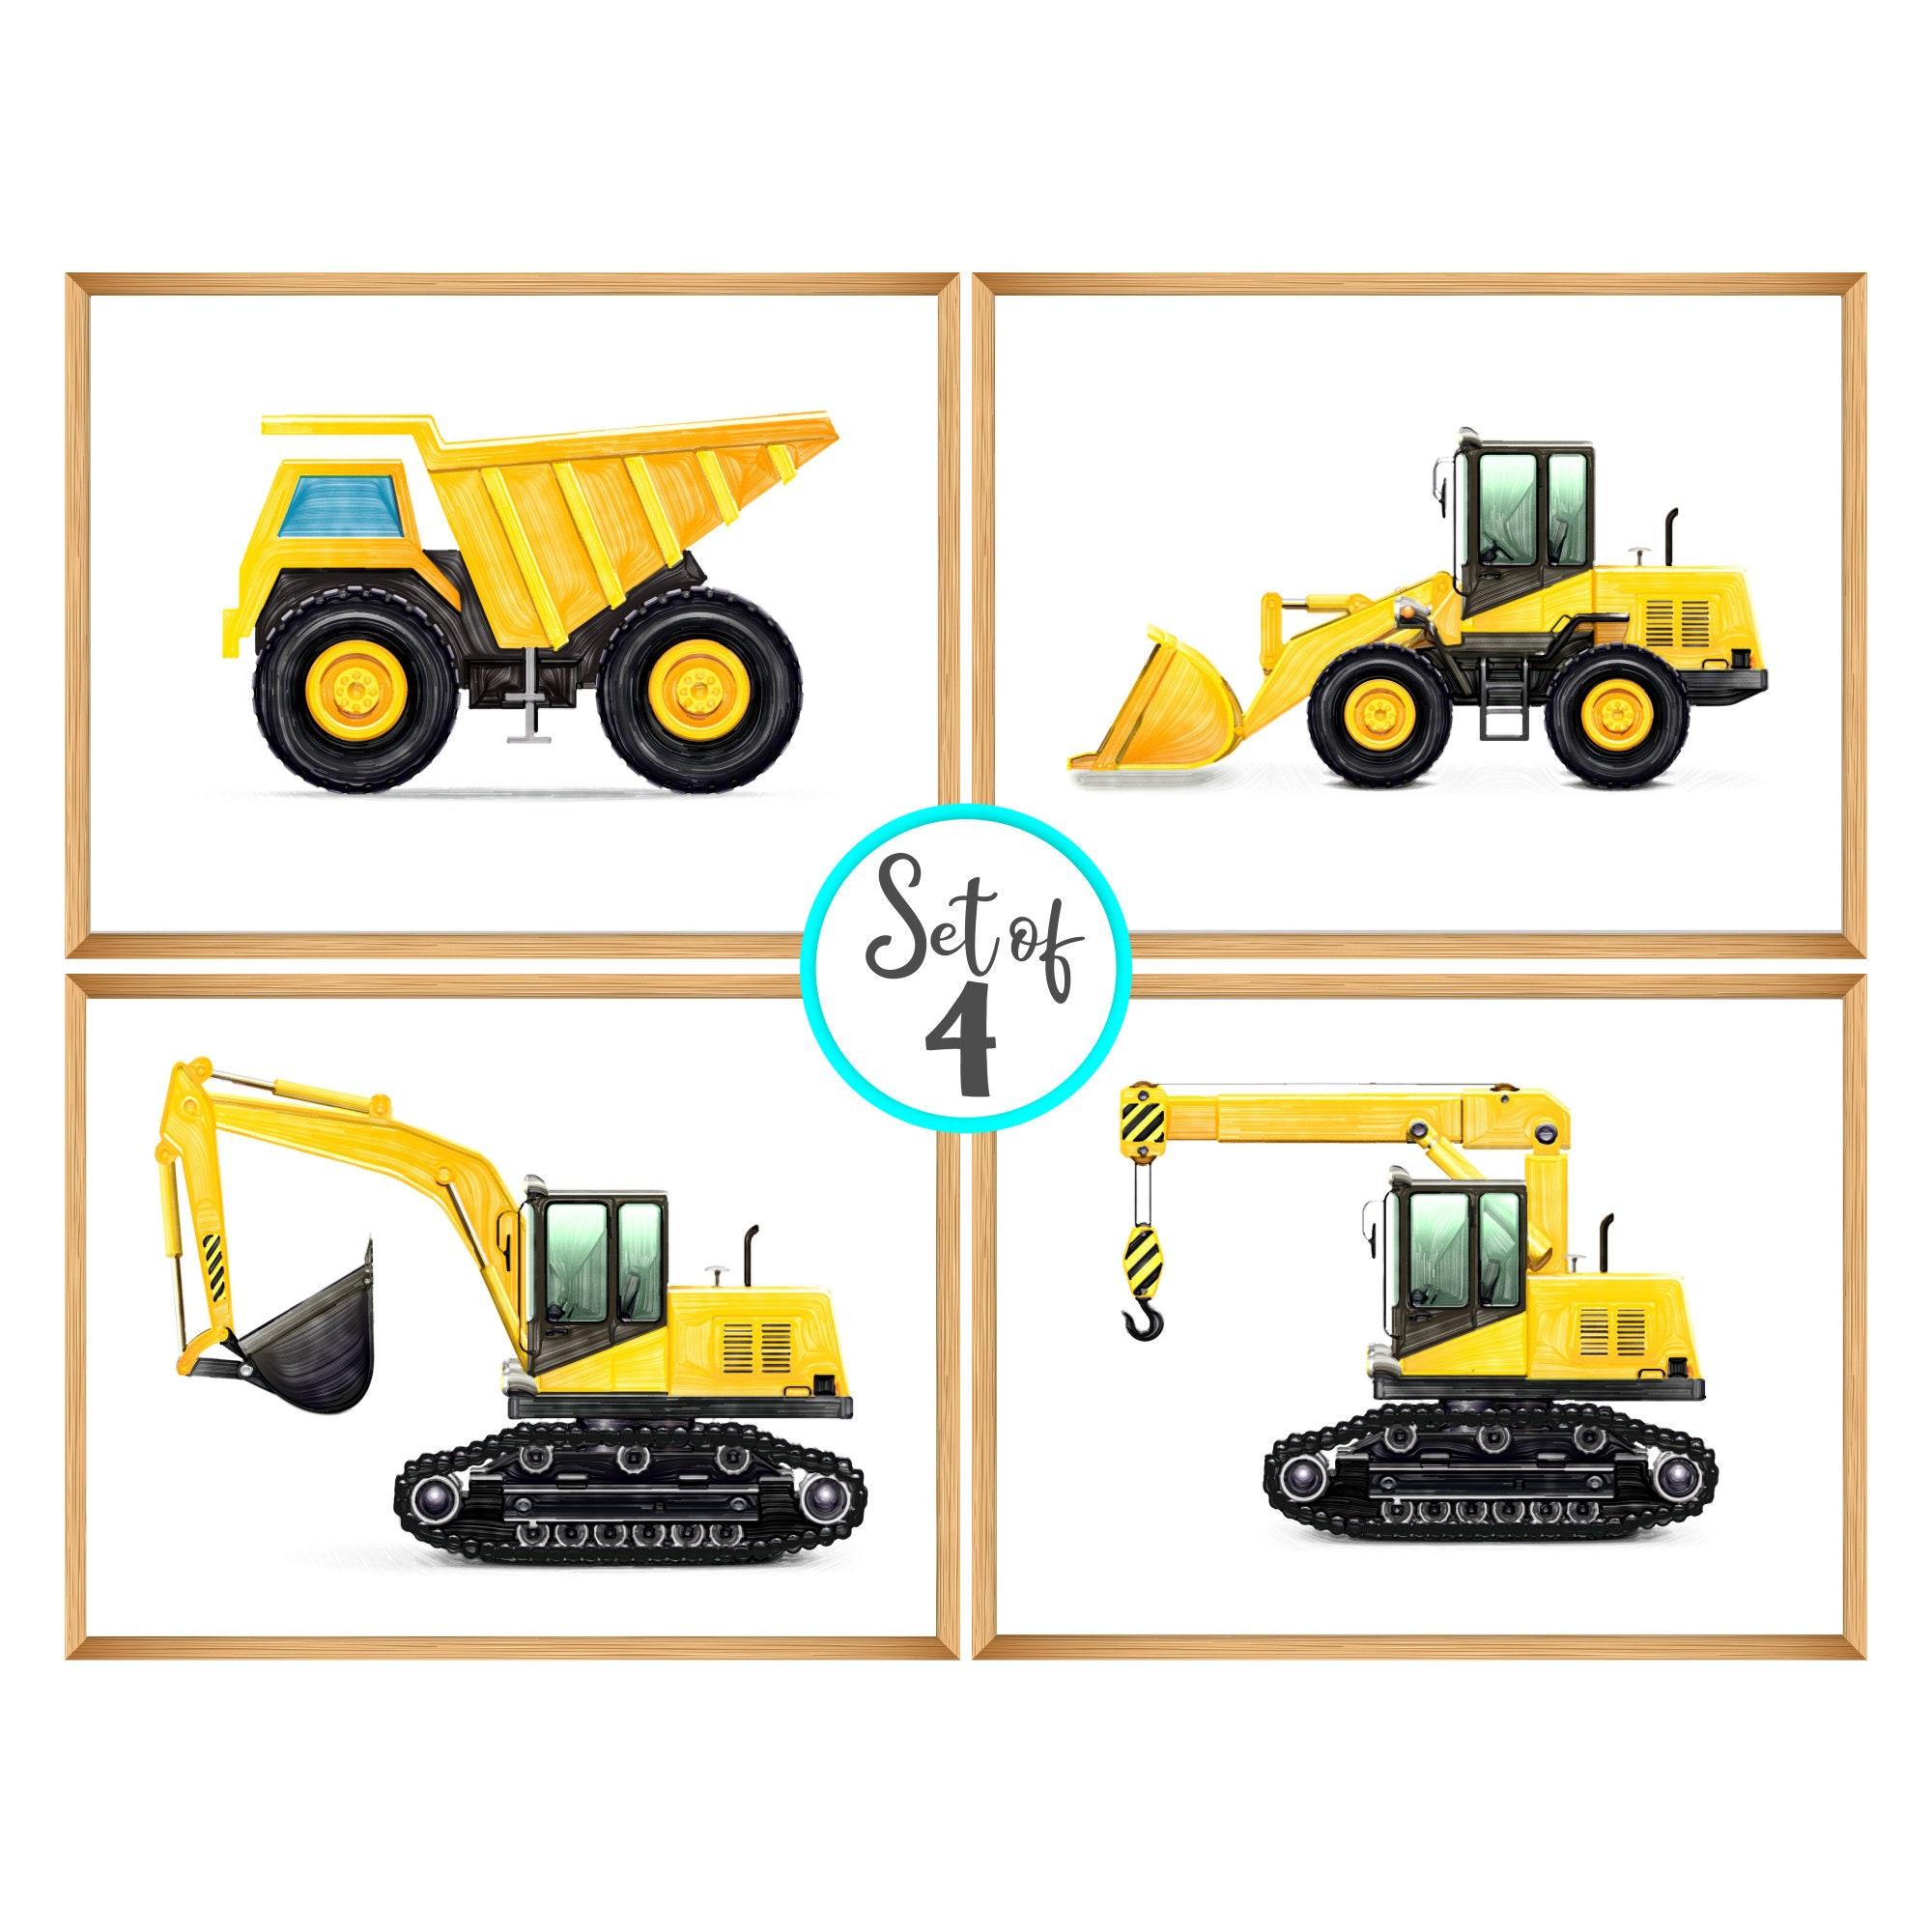 Excavator watercolor Yellow print Instant download Construction art decor Excavator print Construction vehicles Kids room decor